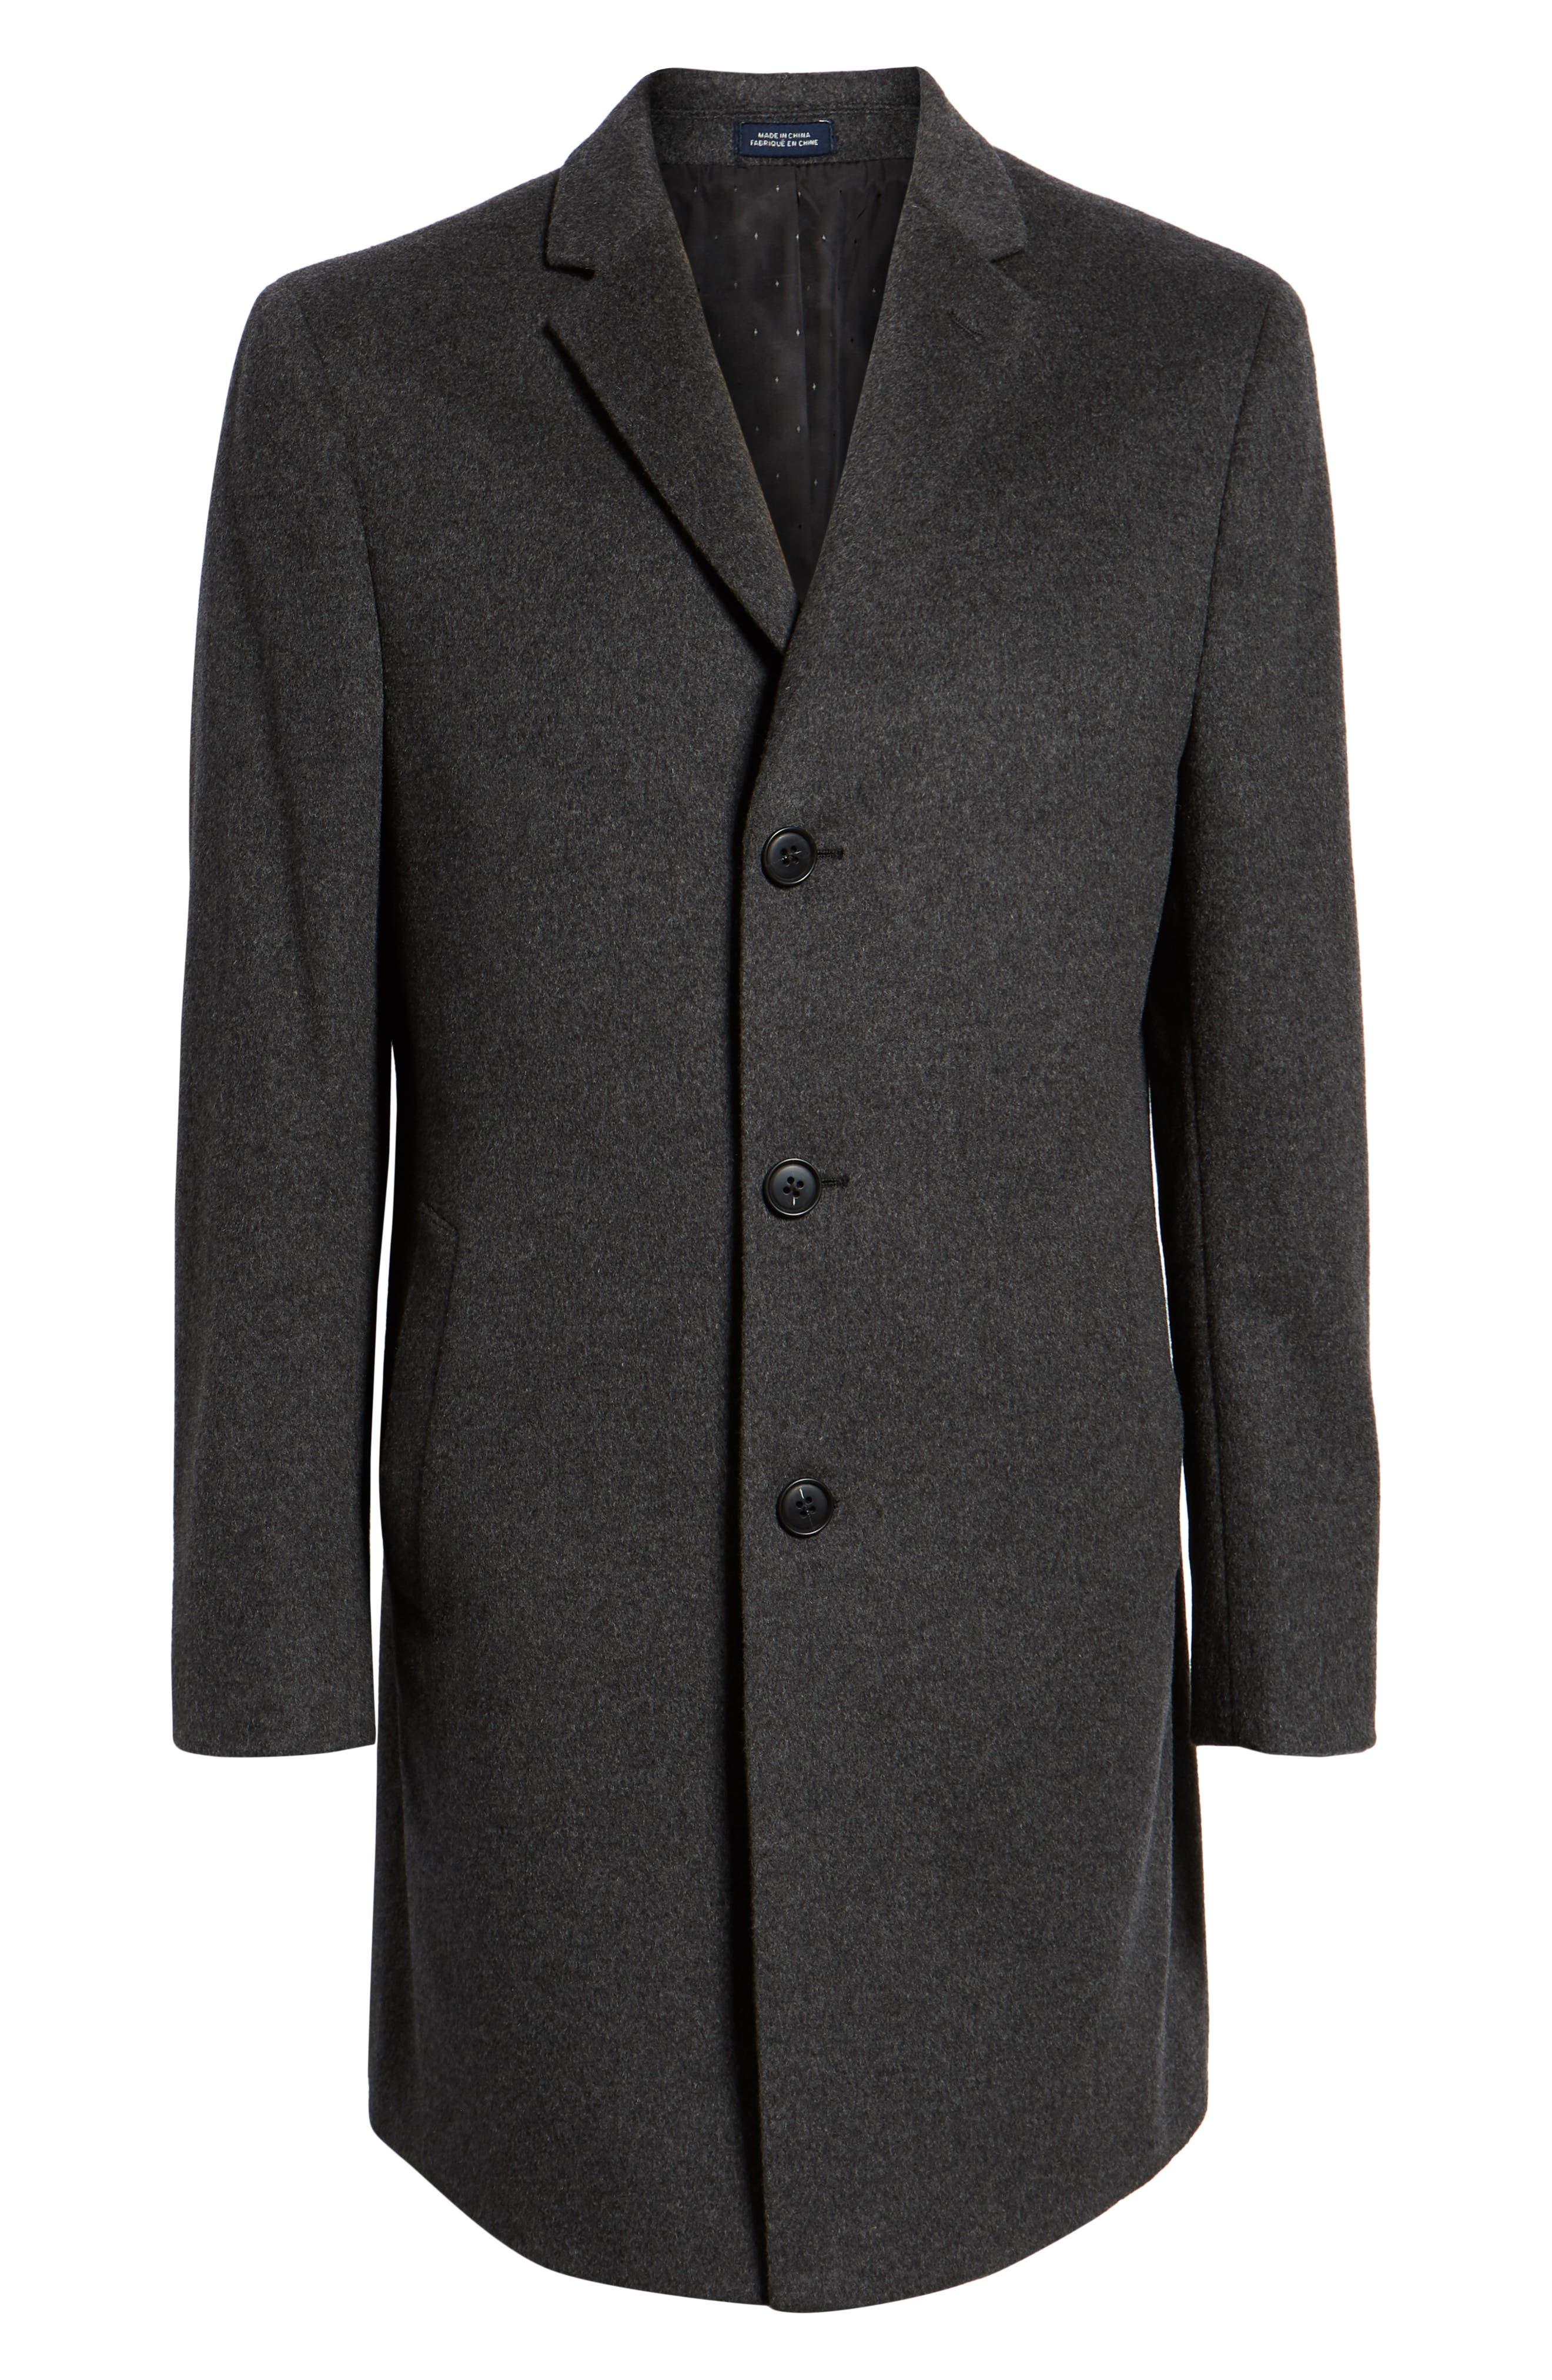 Mason Wool & Cashmere Overcoat,                             Alternate thumbnail 6, color,                             CHARCOAL